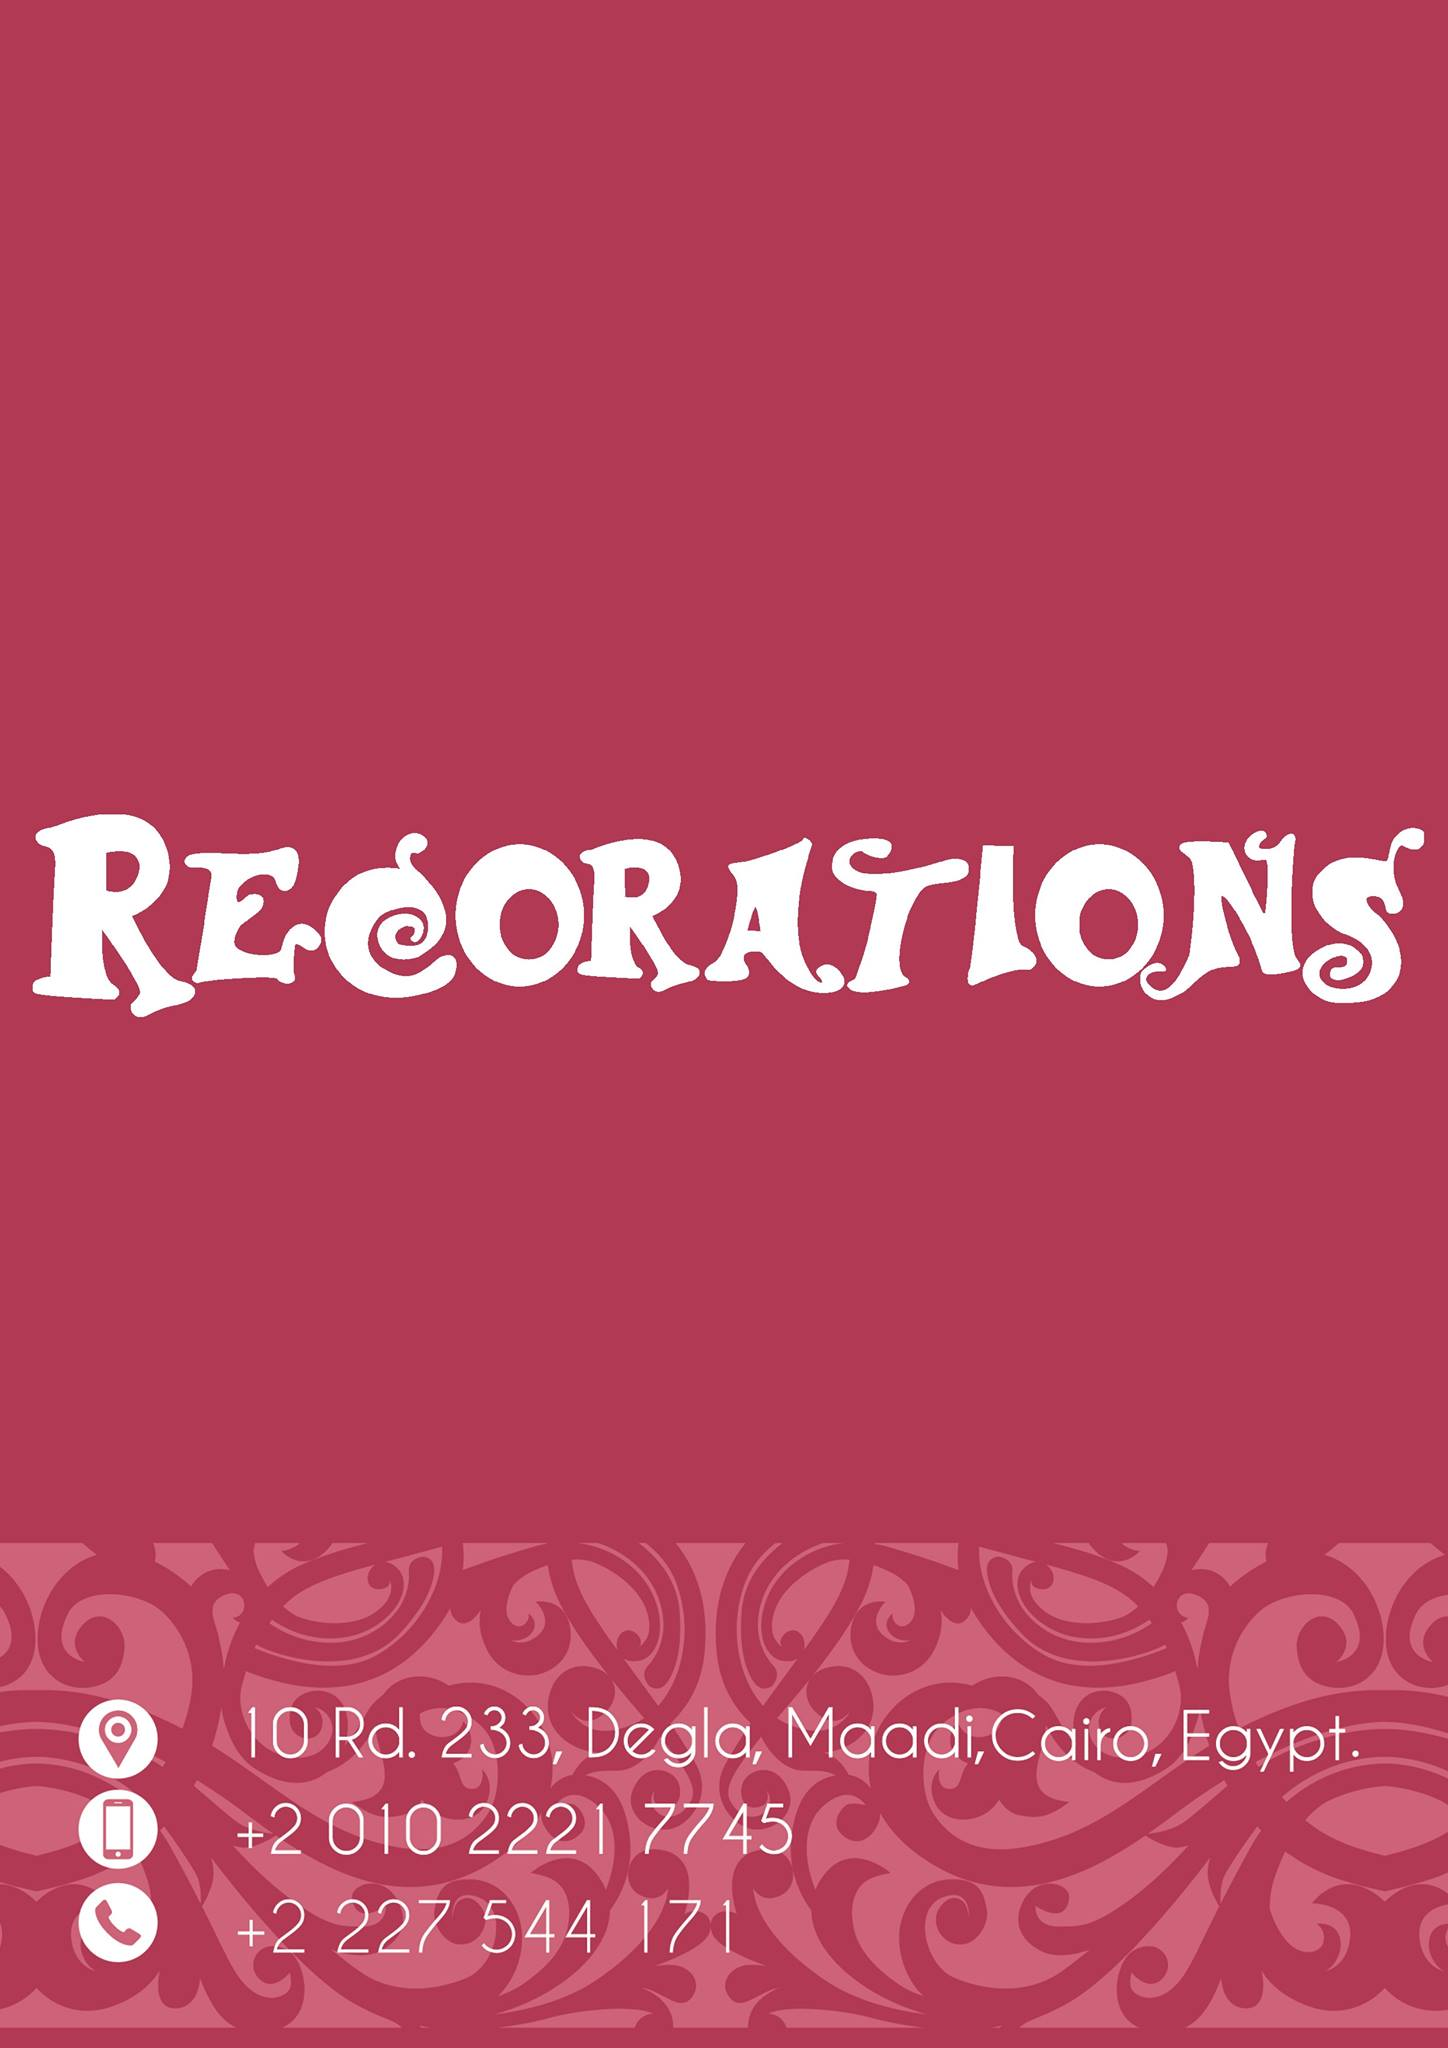 ريكوريشنز هوم أكسيسوريز Recorations